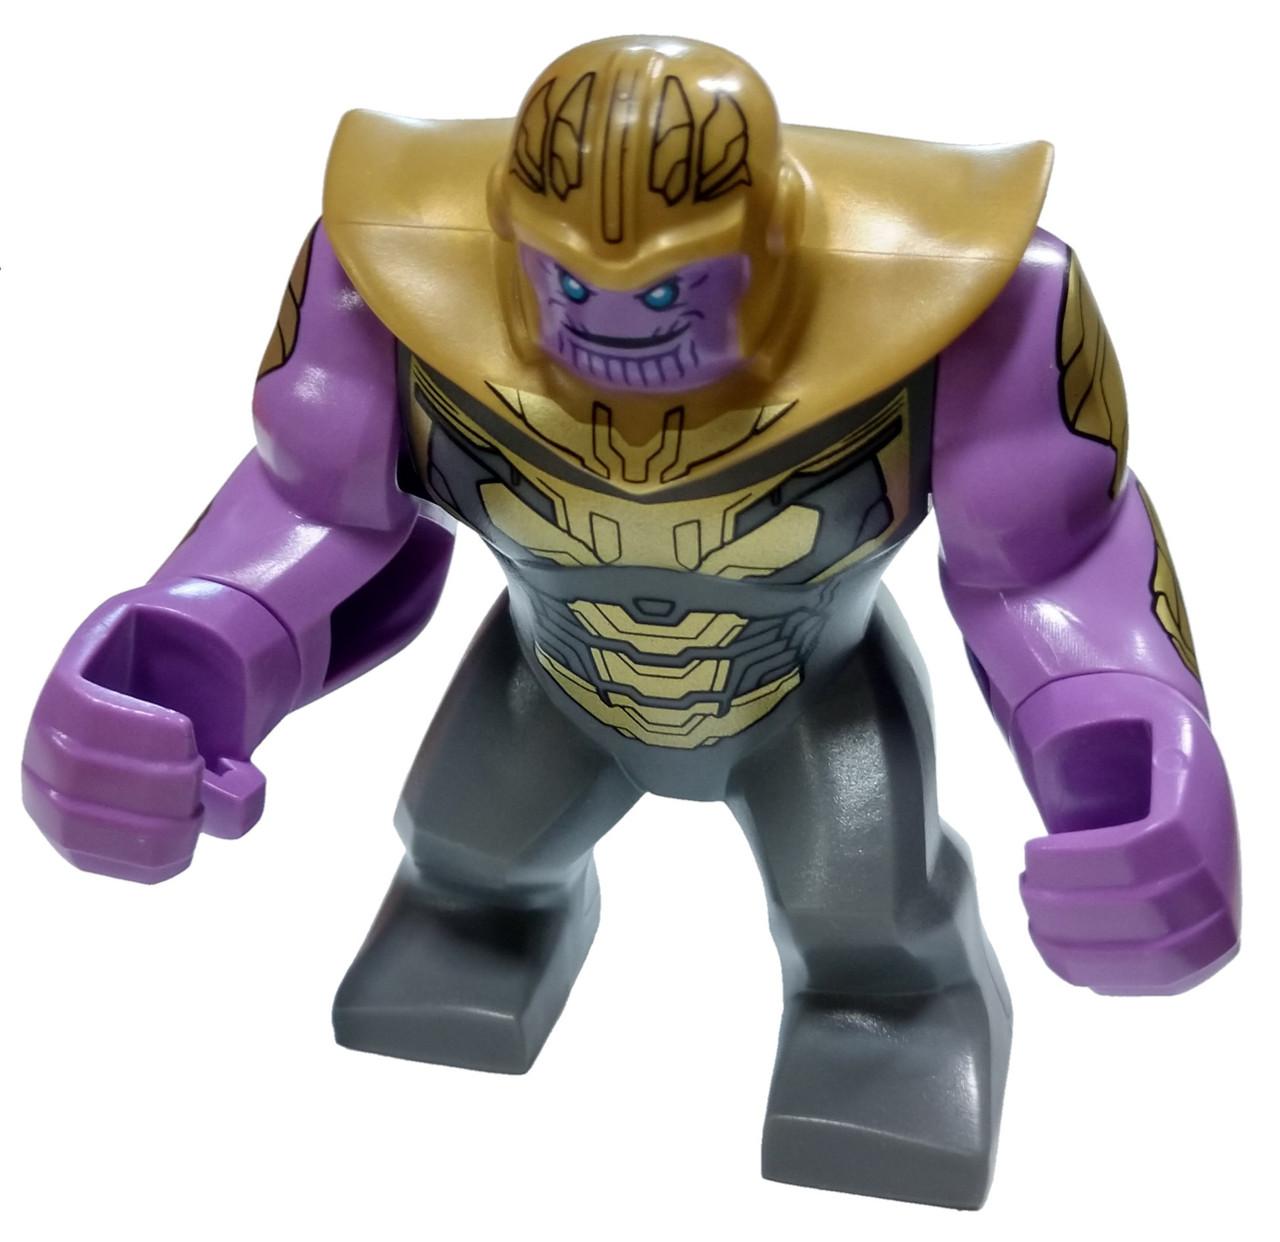 Avengers Endgame Lego Thanos Big Size Figure Marvel Stones Infinity Gauntlet